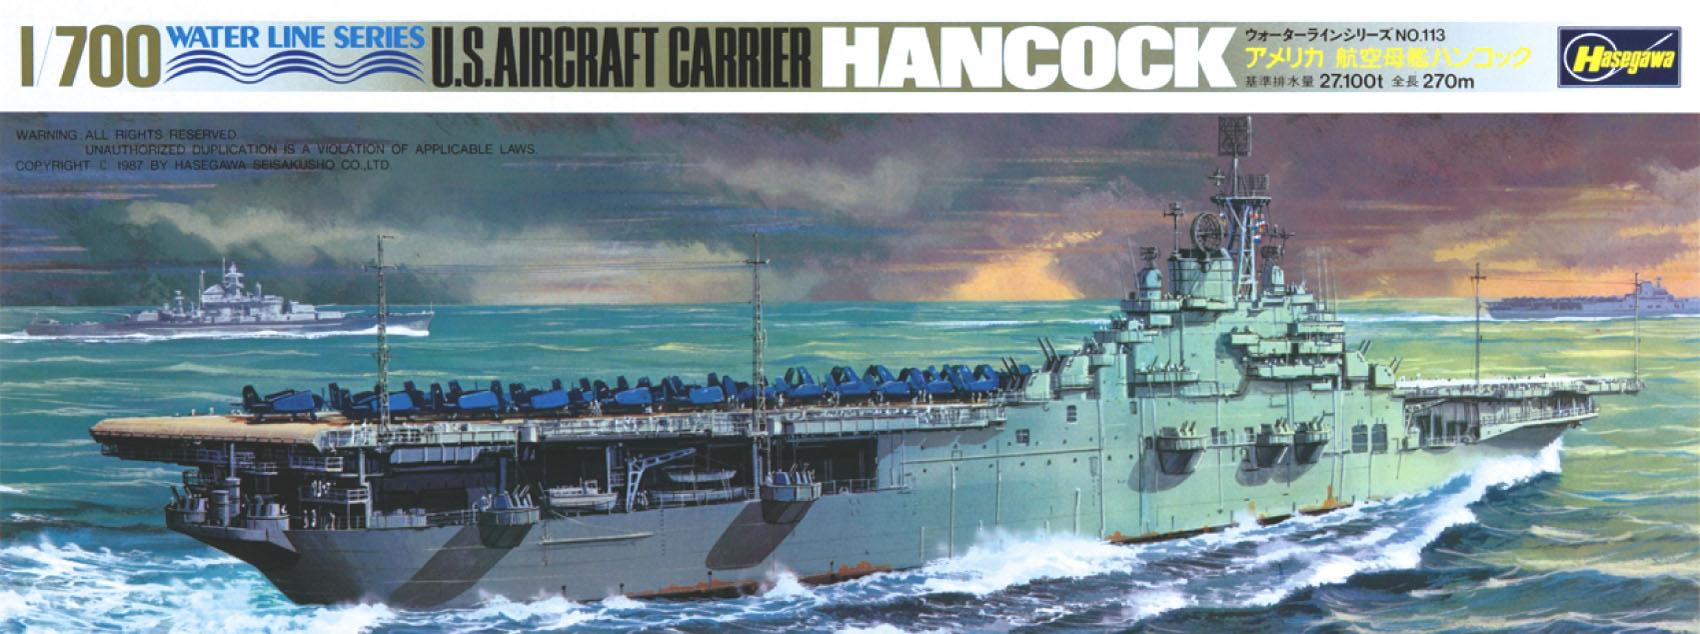 Hasegawa U.S. Aircraft Carrier Hancock